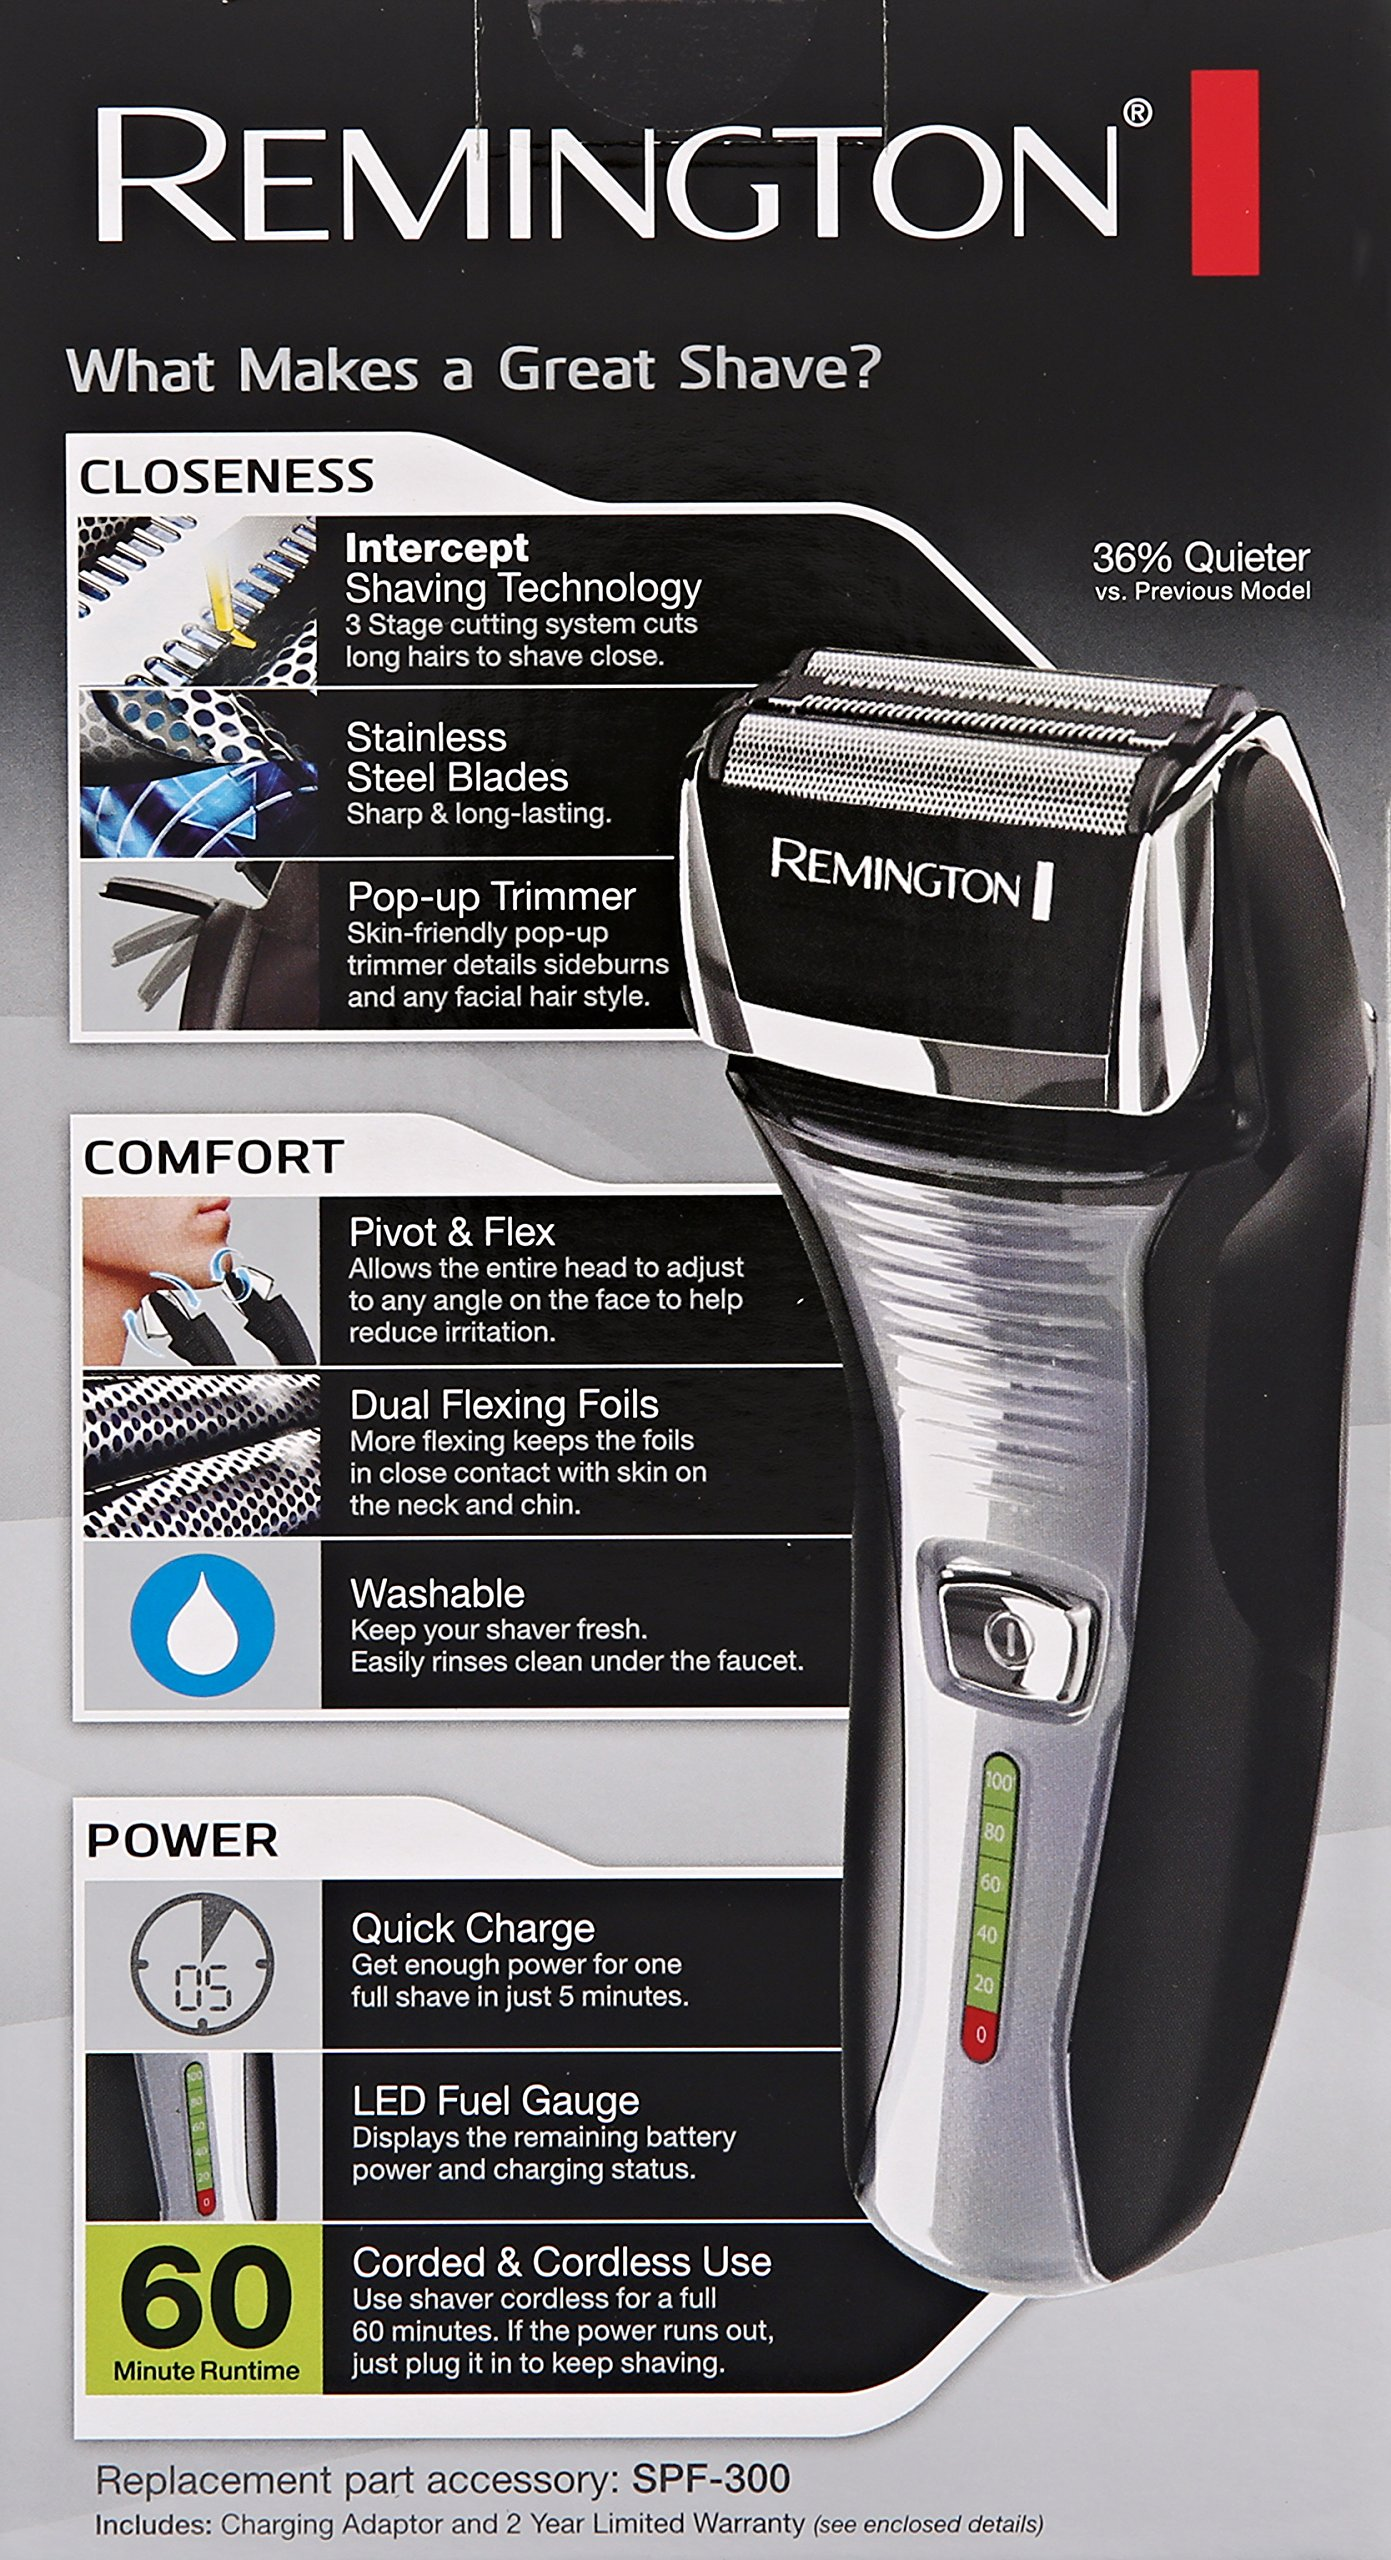 Remington F5-5800 Foil Shaver, Men's Electric Razor, Electric Shaver, Black by Remington (Image #6)